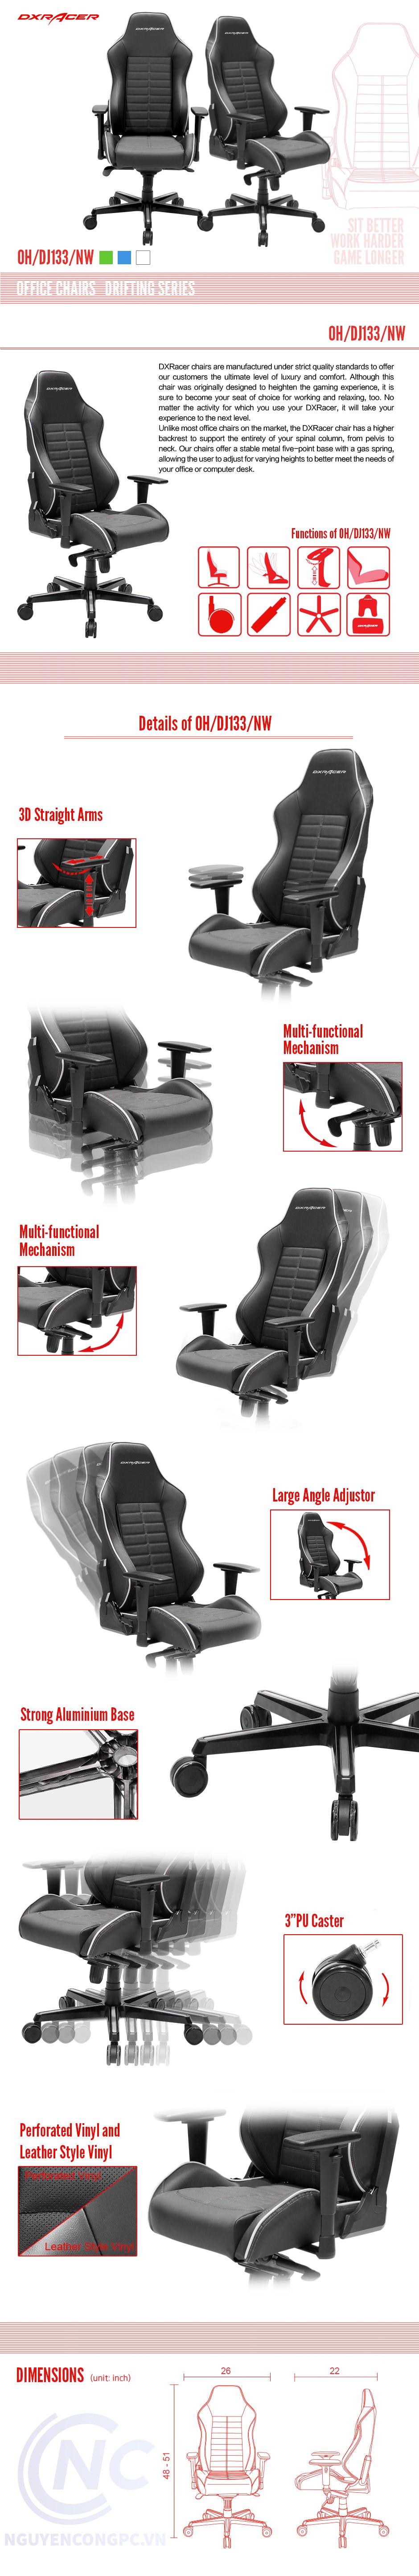 Ghế DXRacer Drifting Series PRO PU Leather DJ133-NW (Đen/Trắng)